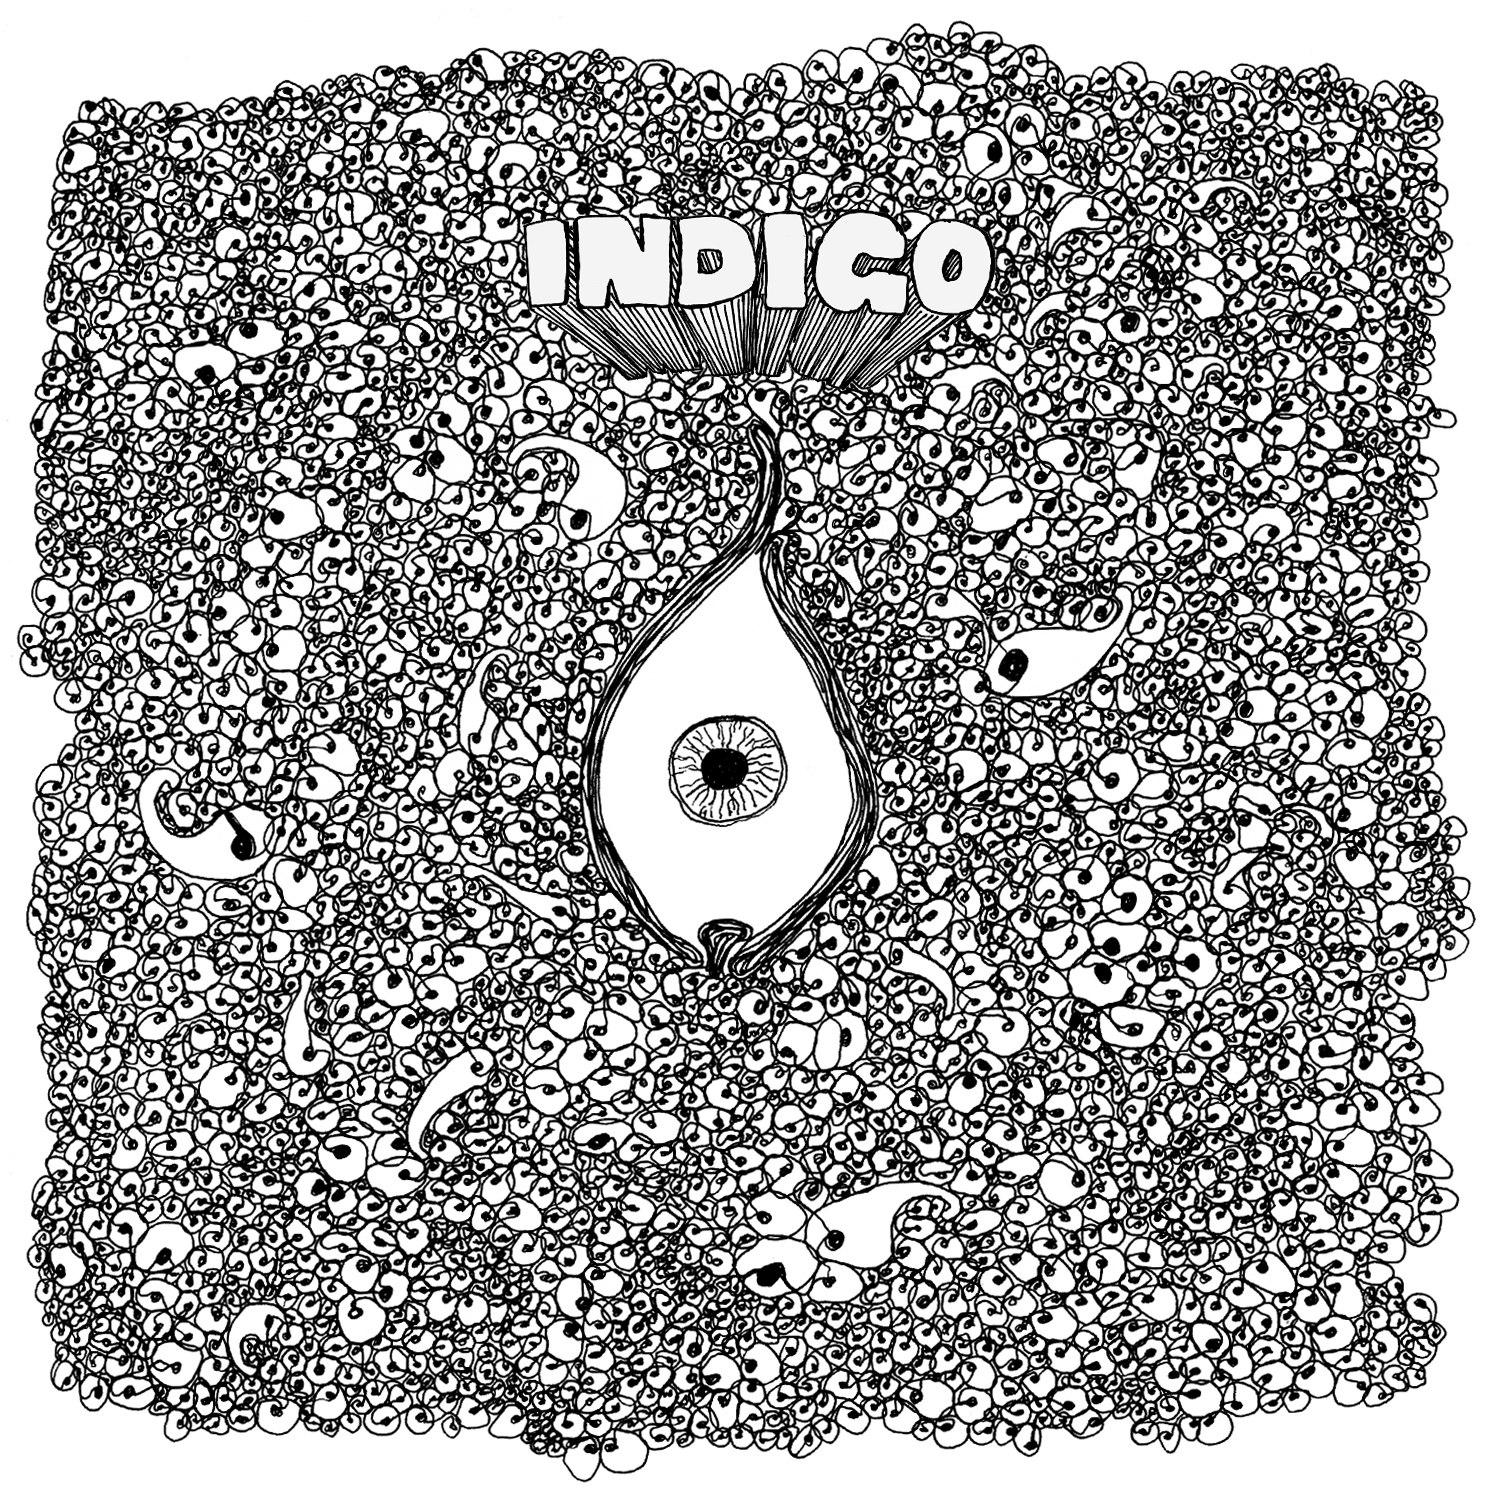 SampleMinded - Indigo  (2012)